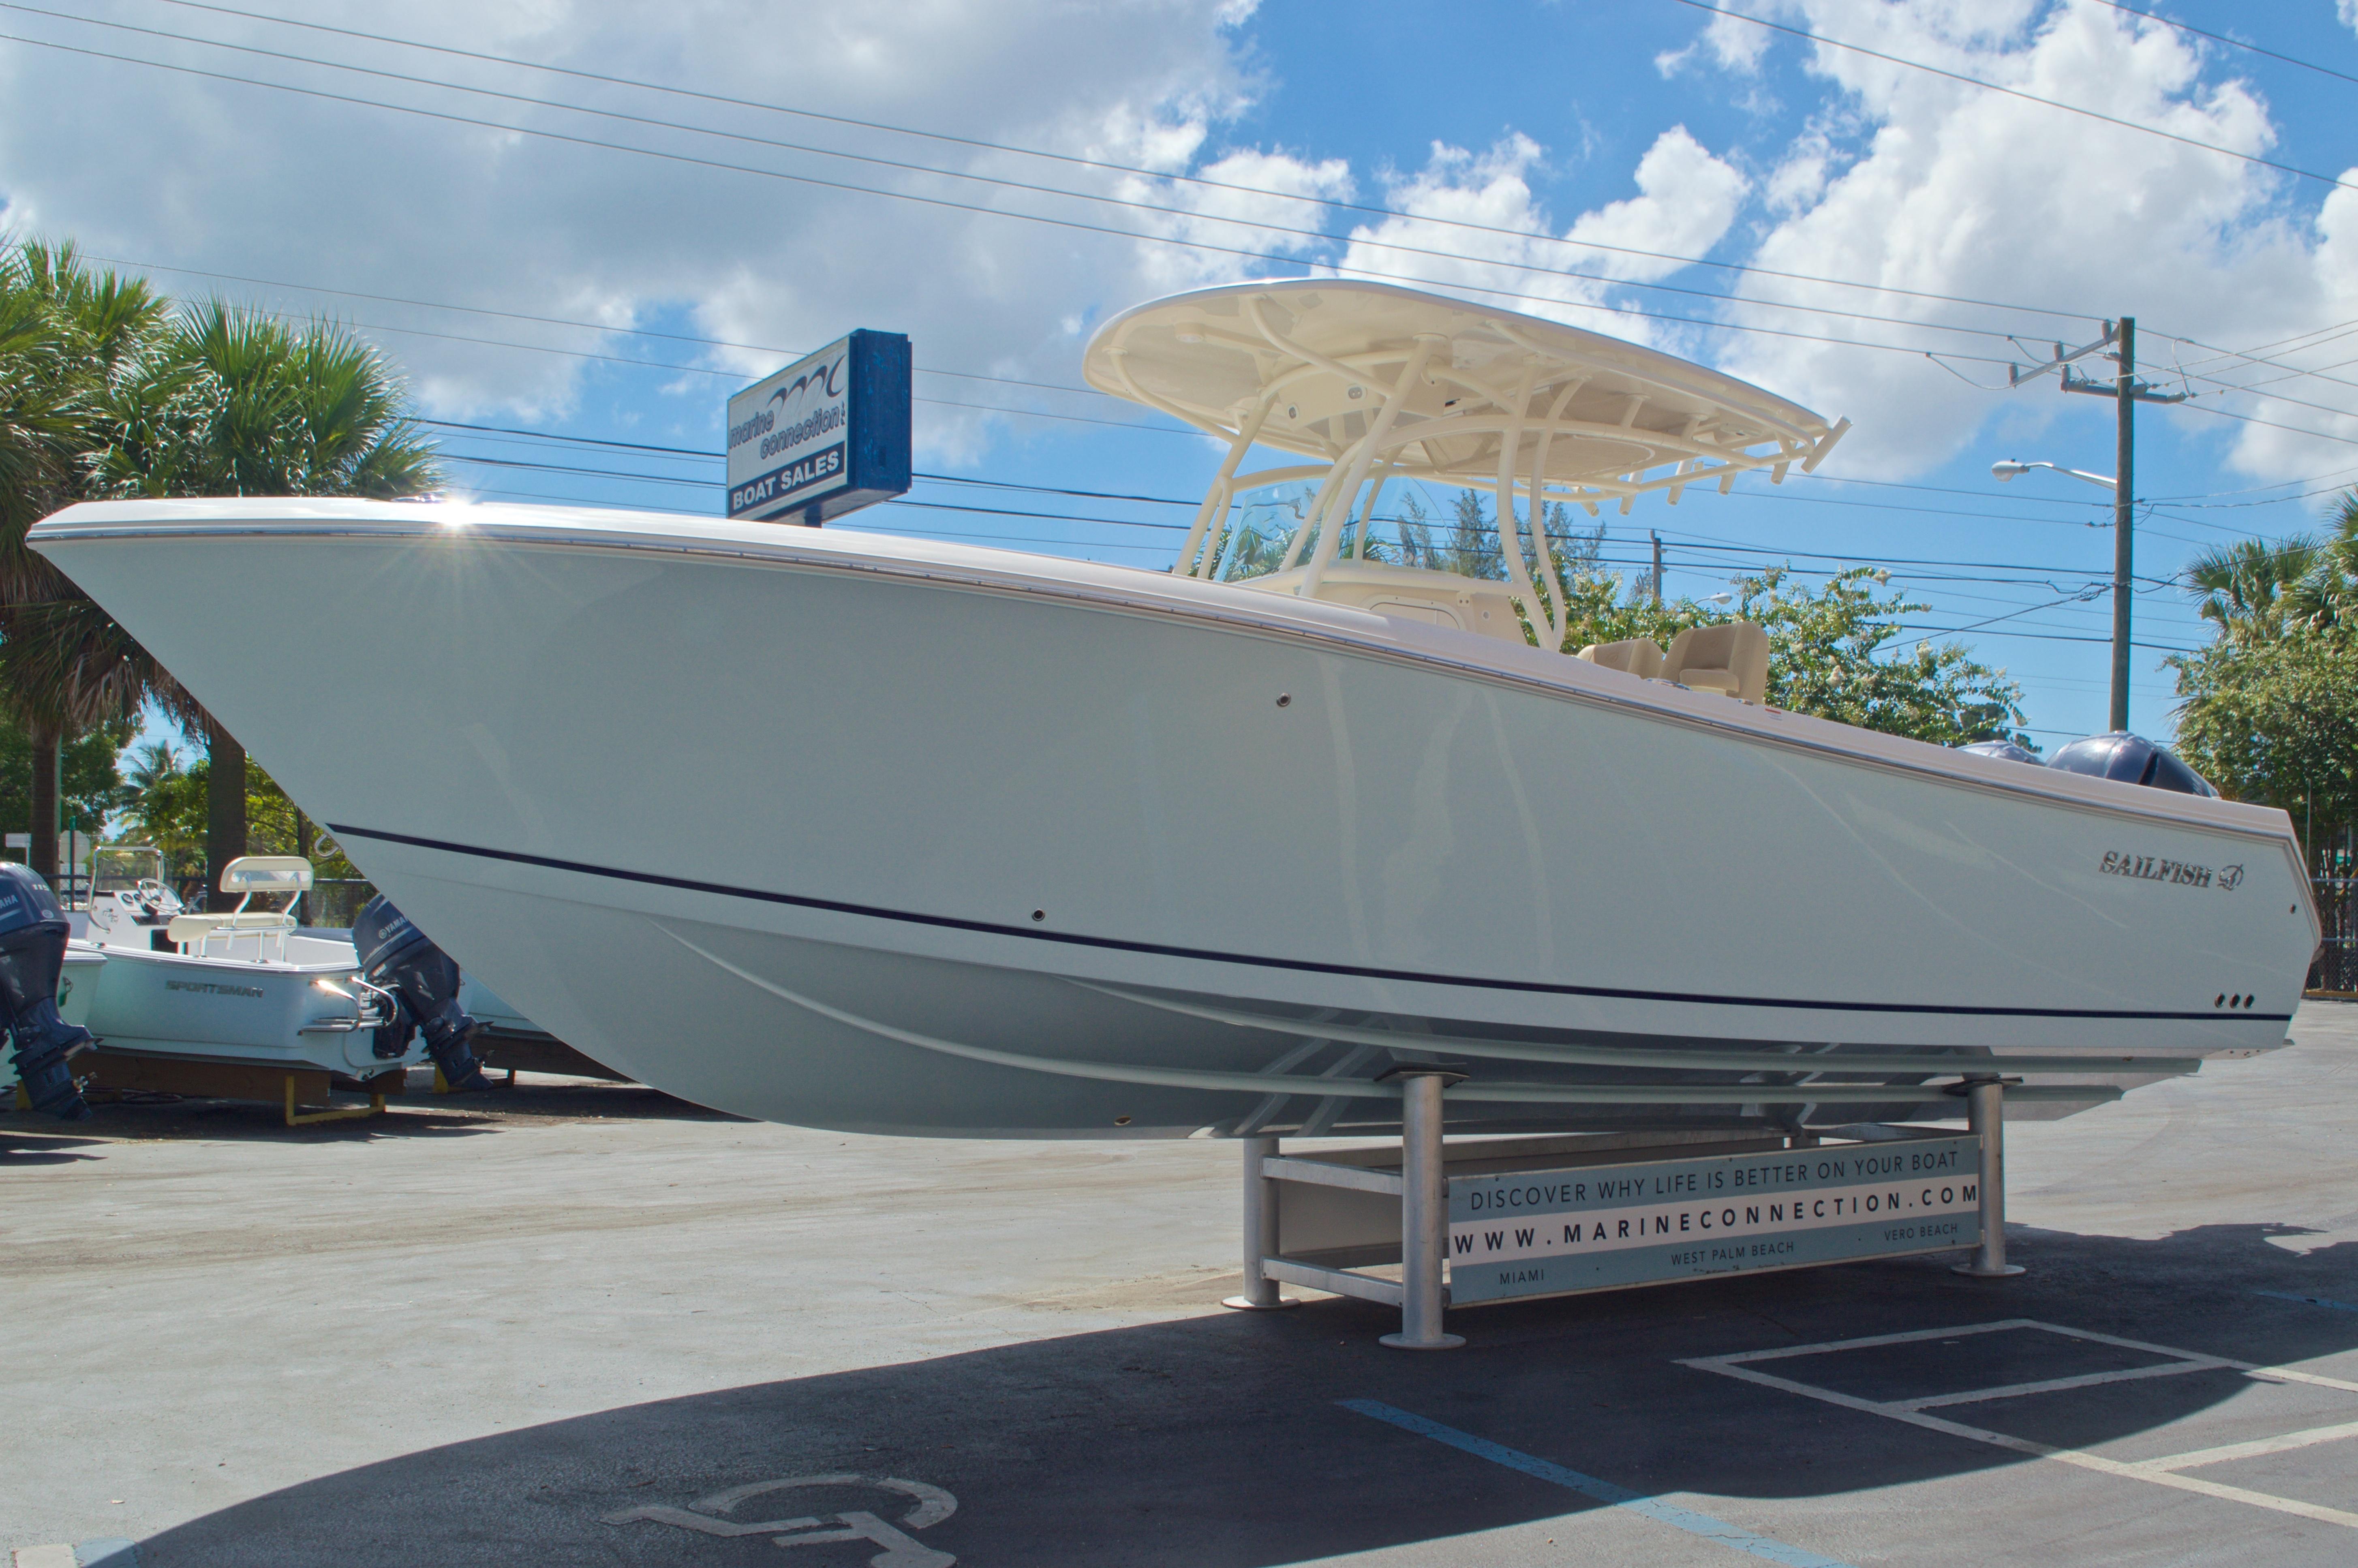 Thumbnail 4 for New 2017 Sailfish 290 CC Center Console boat for sale in Vero Beach, FL